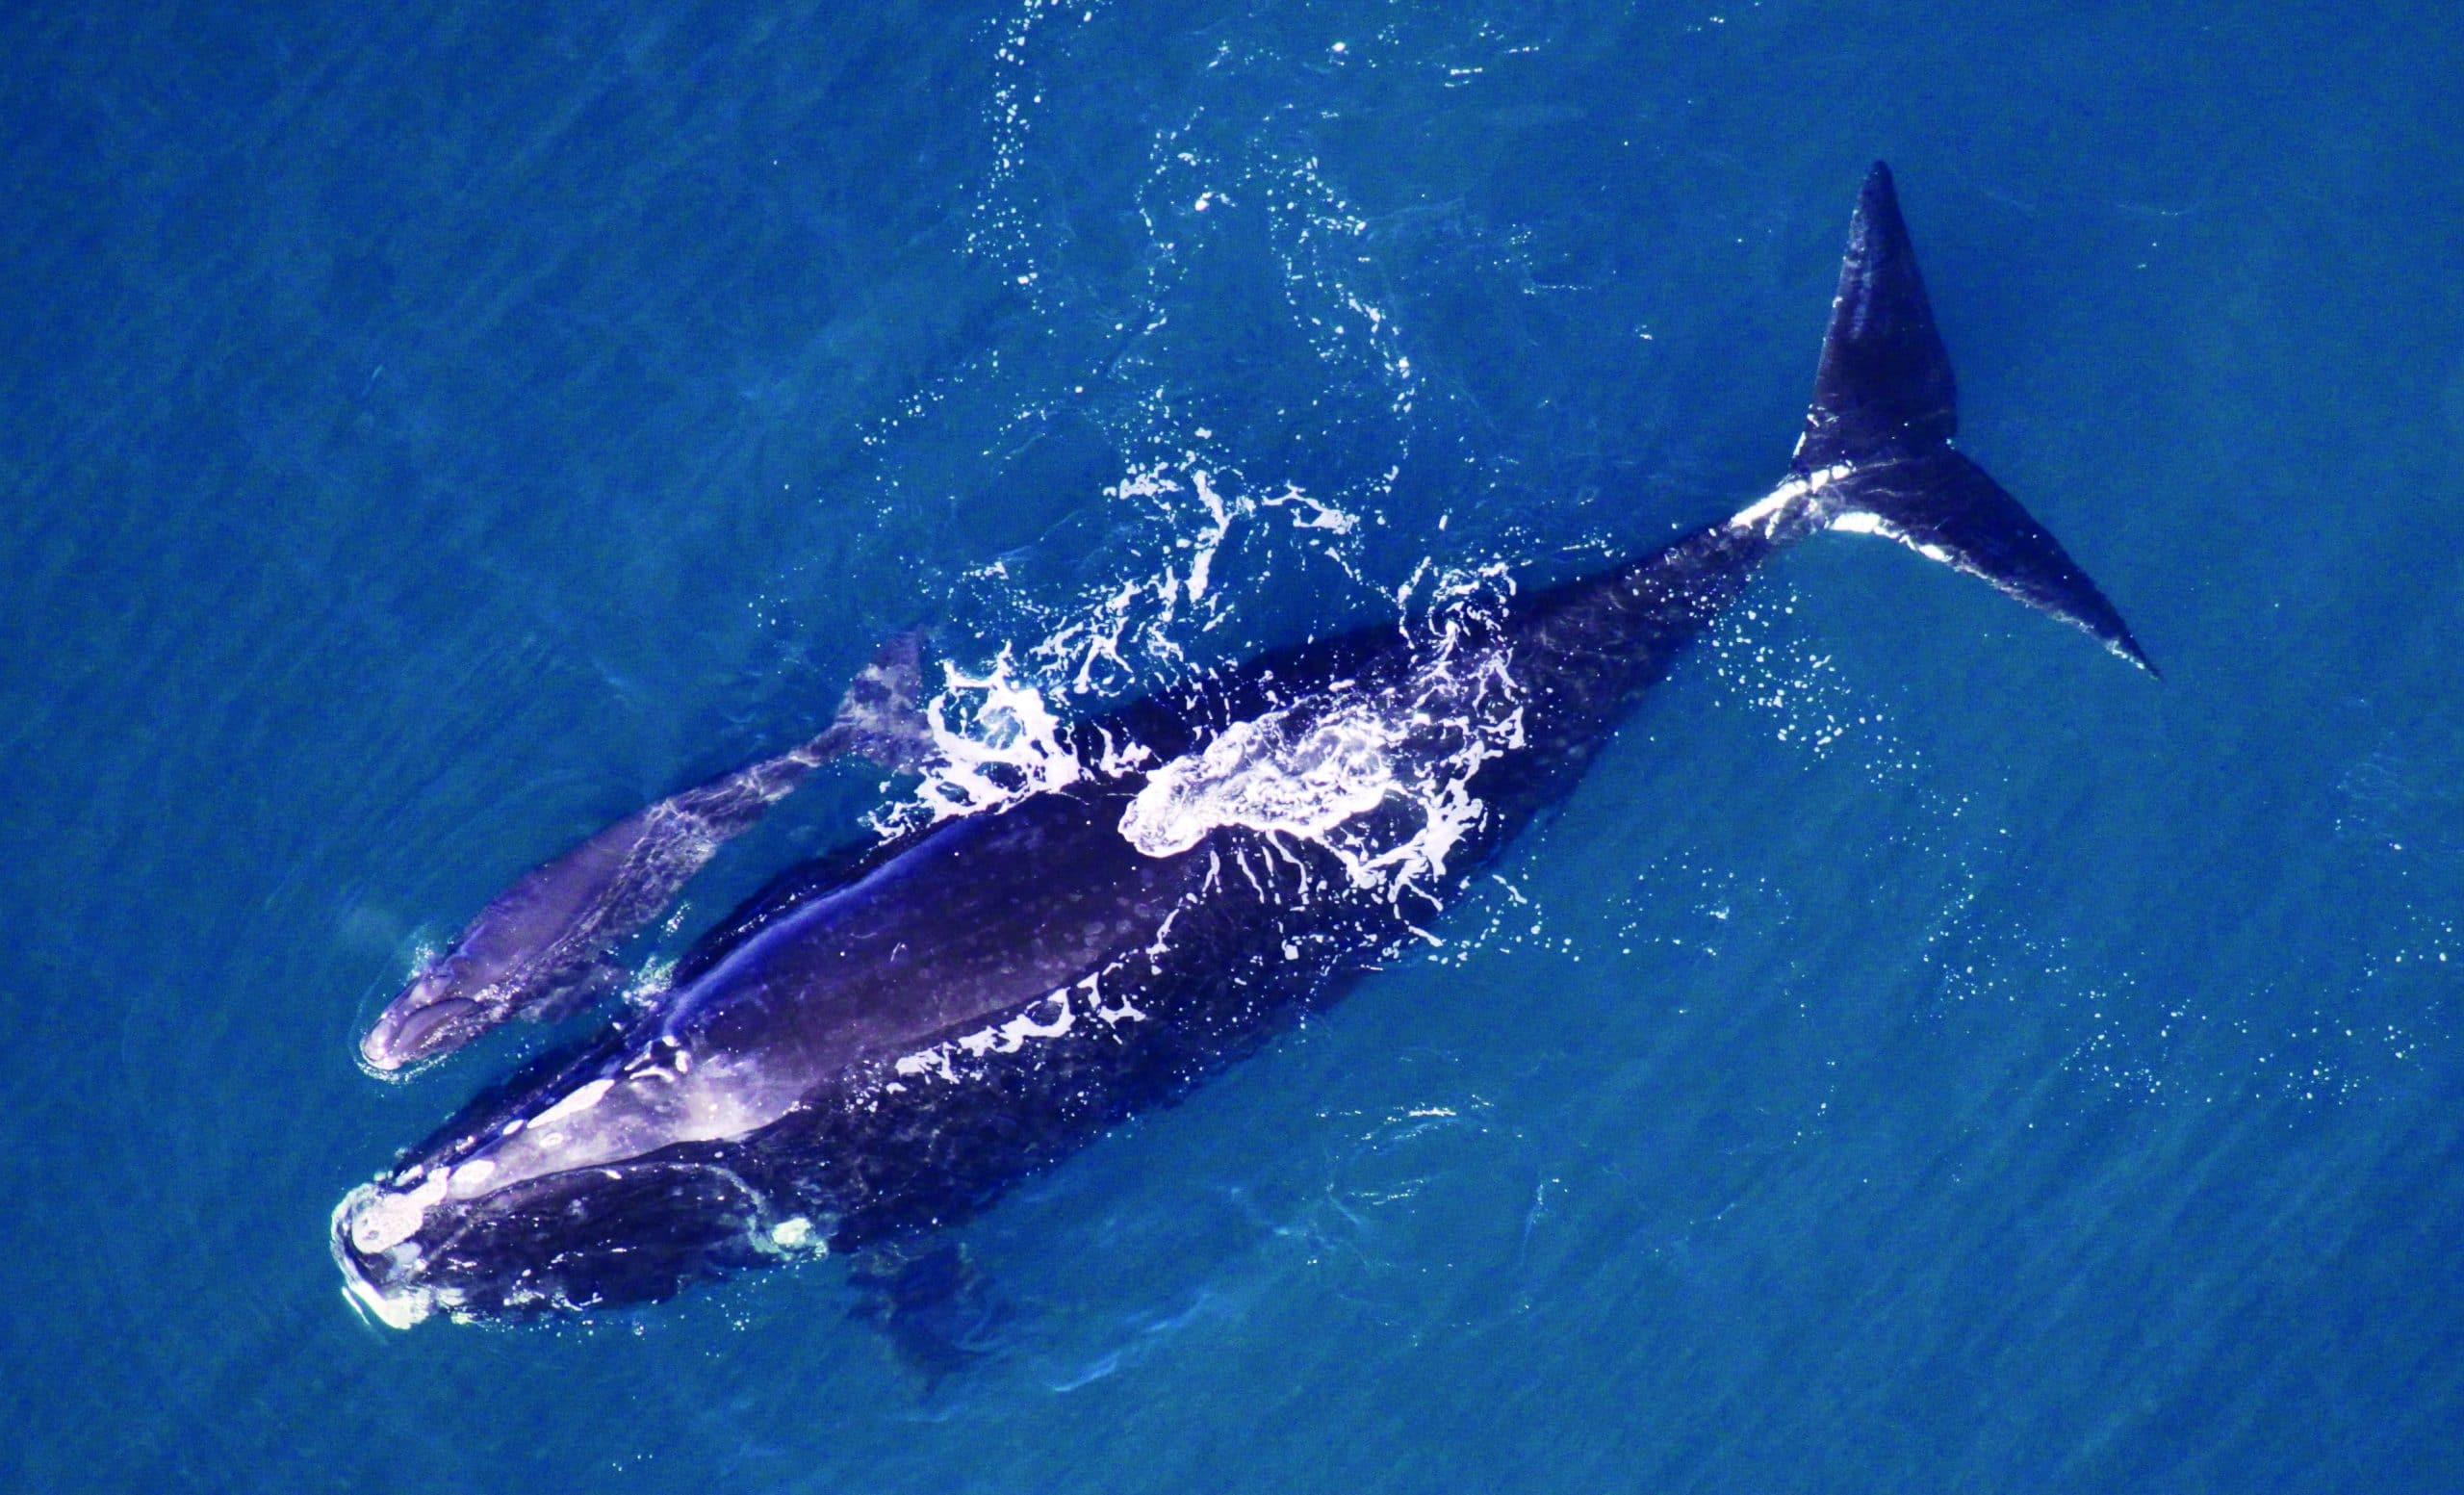 Photo taken by Sea to Shore Alliance under NOAA Permit #15488